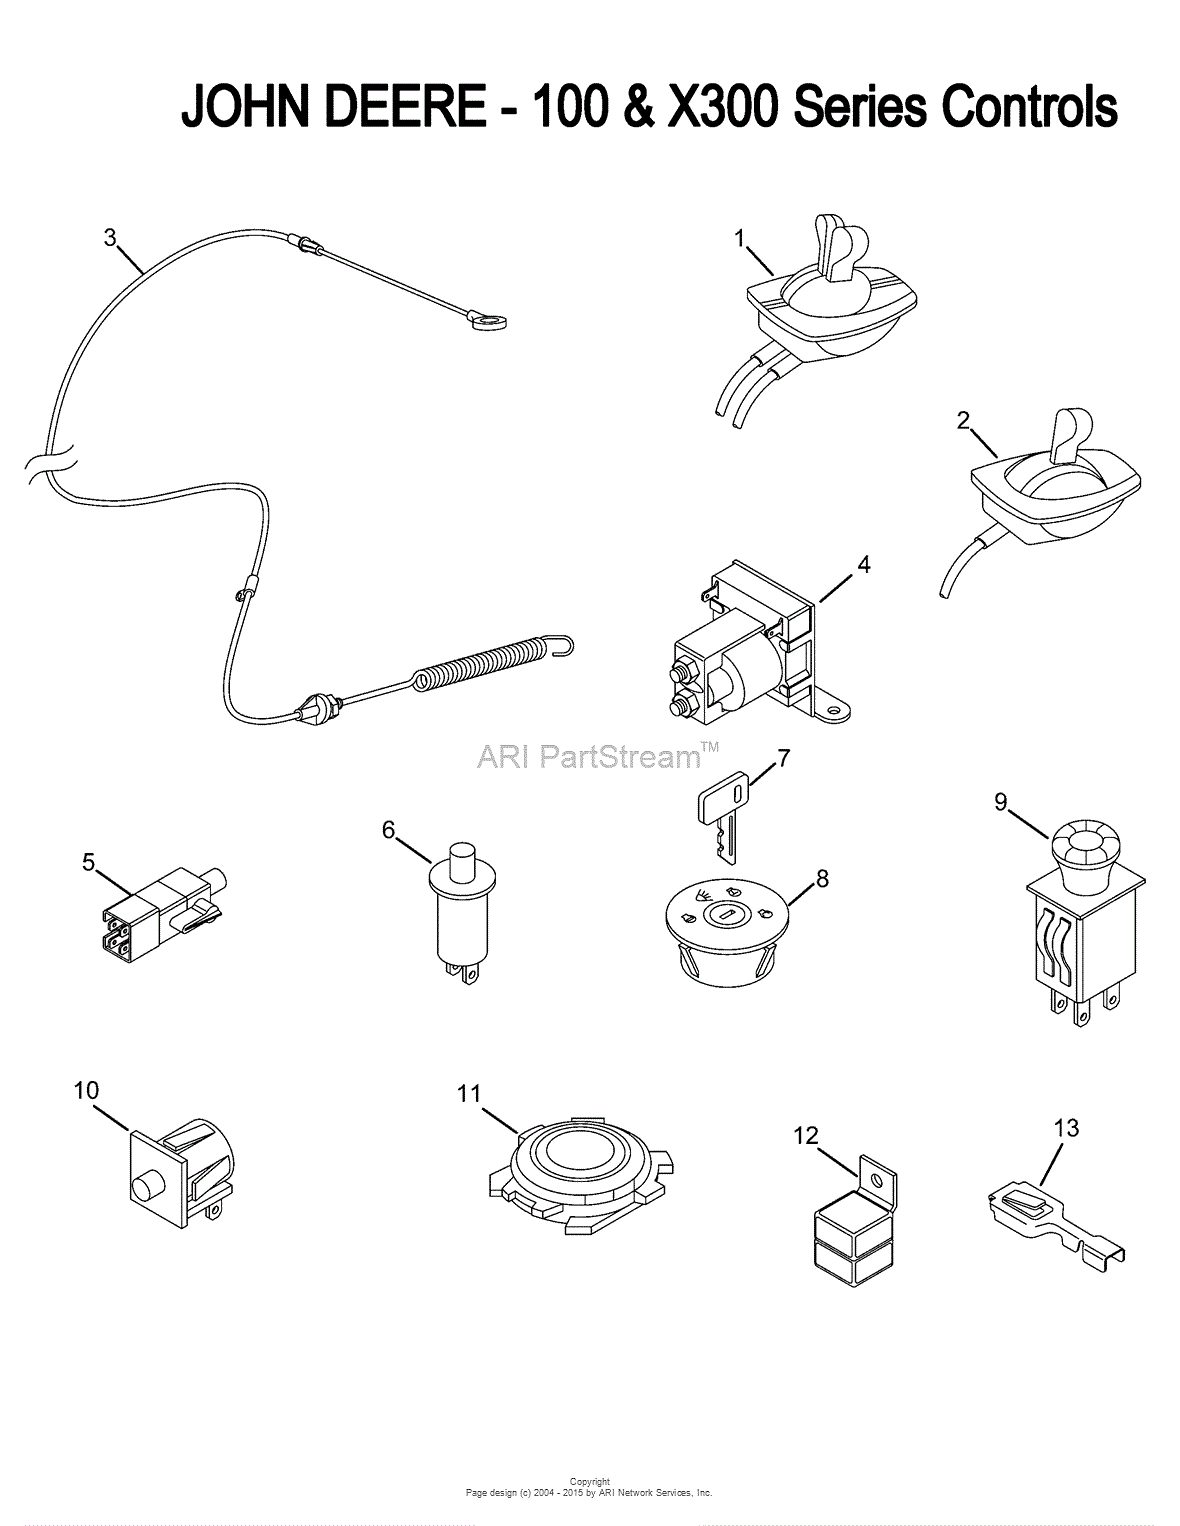 John Deere 1010 Wiring Schematic Library 100 Diagram L100 Diagrams Lx176